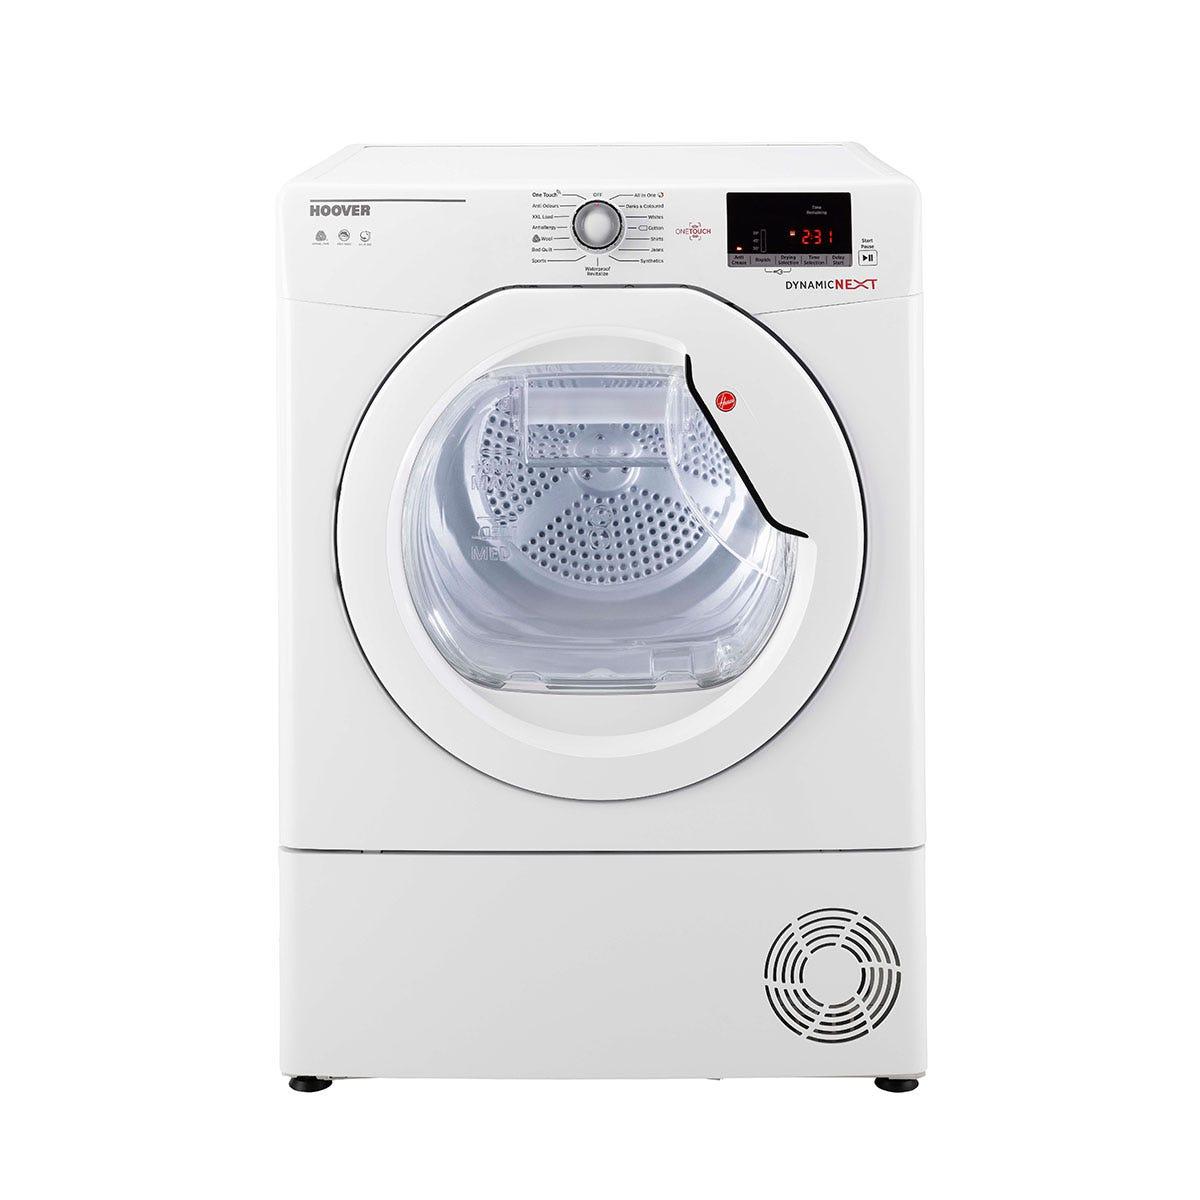 Hoover DXC10DE Dynamic Next 10kg Smart Condenser Tumble Dryer with Aquavision - White